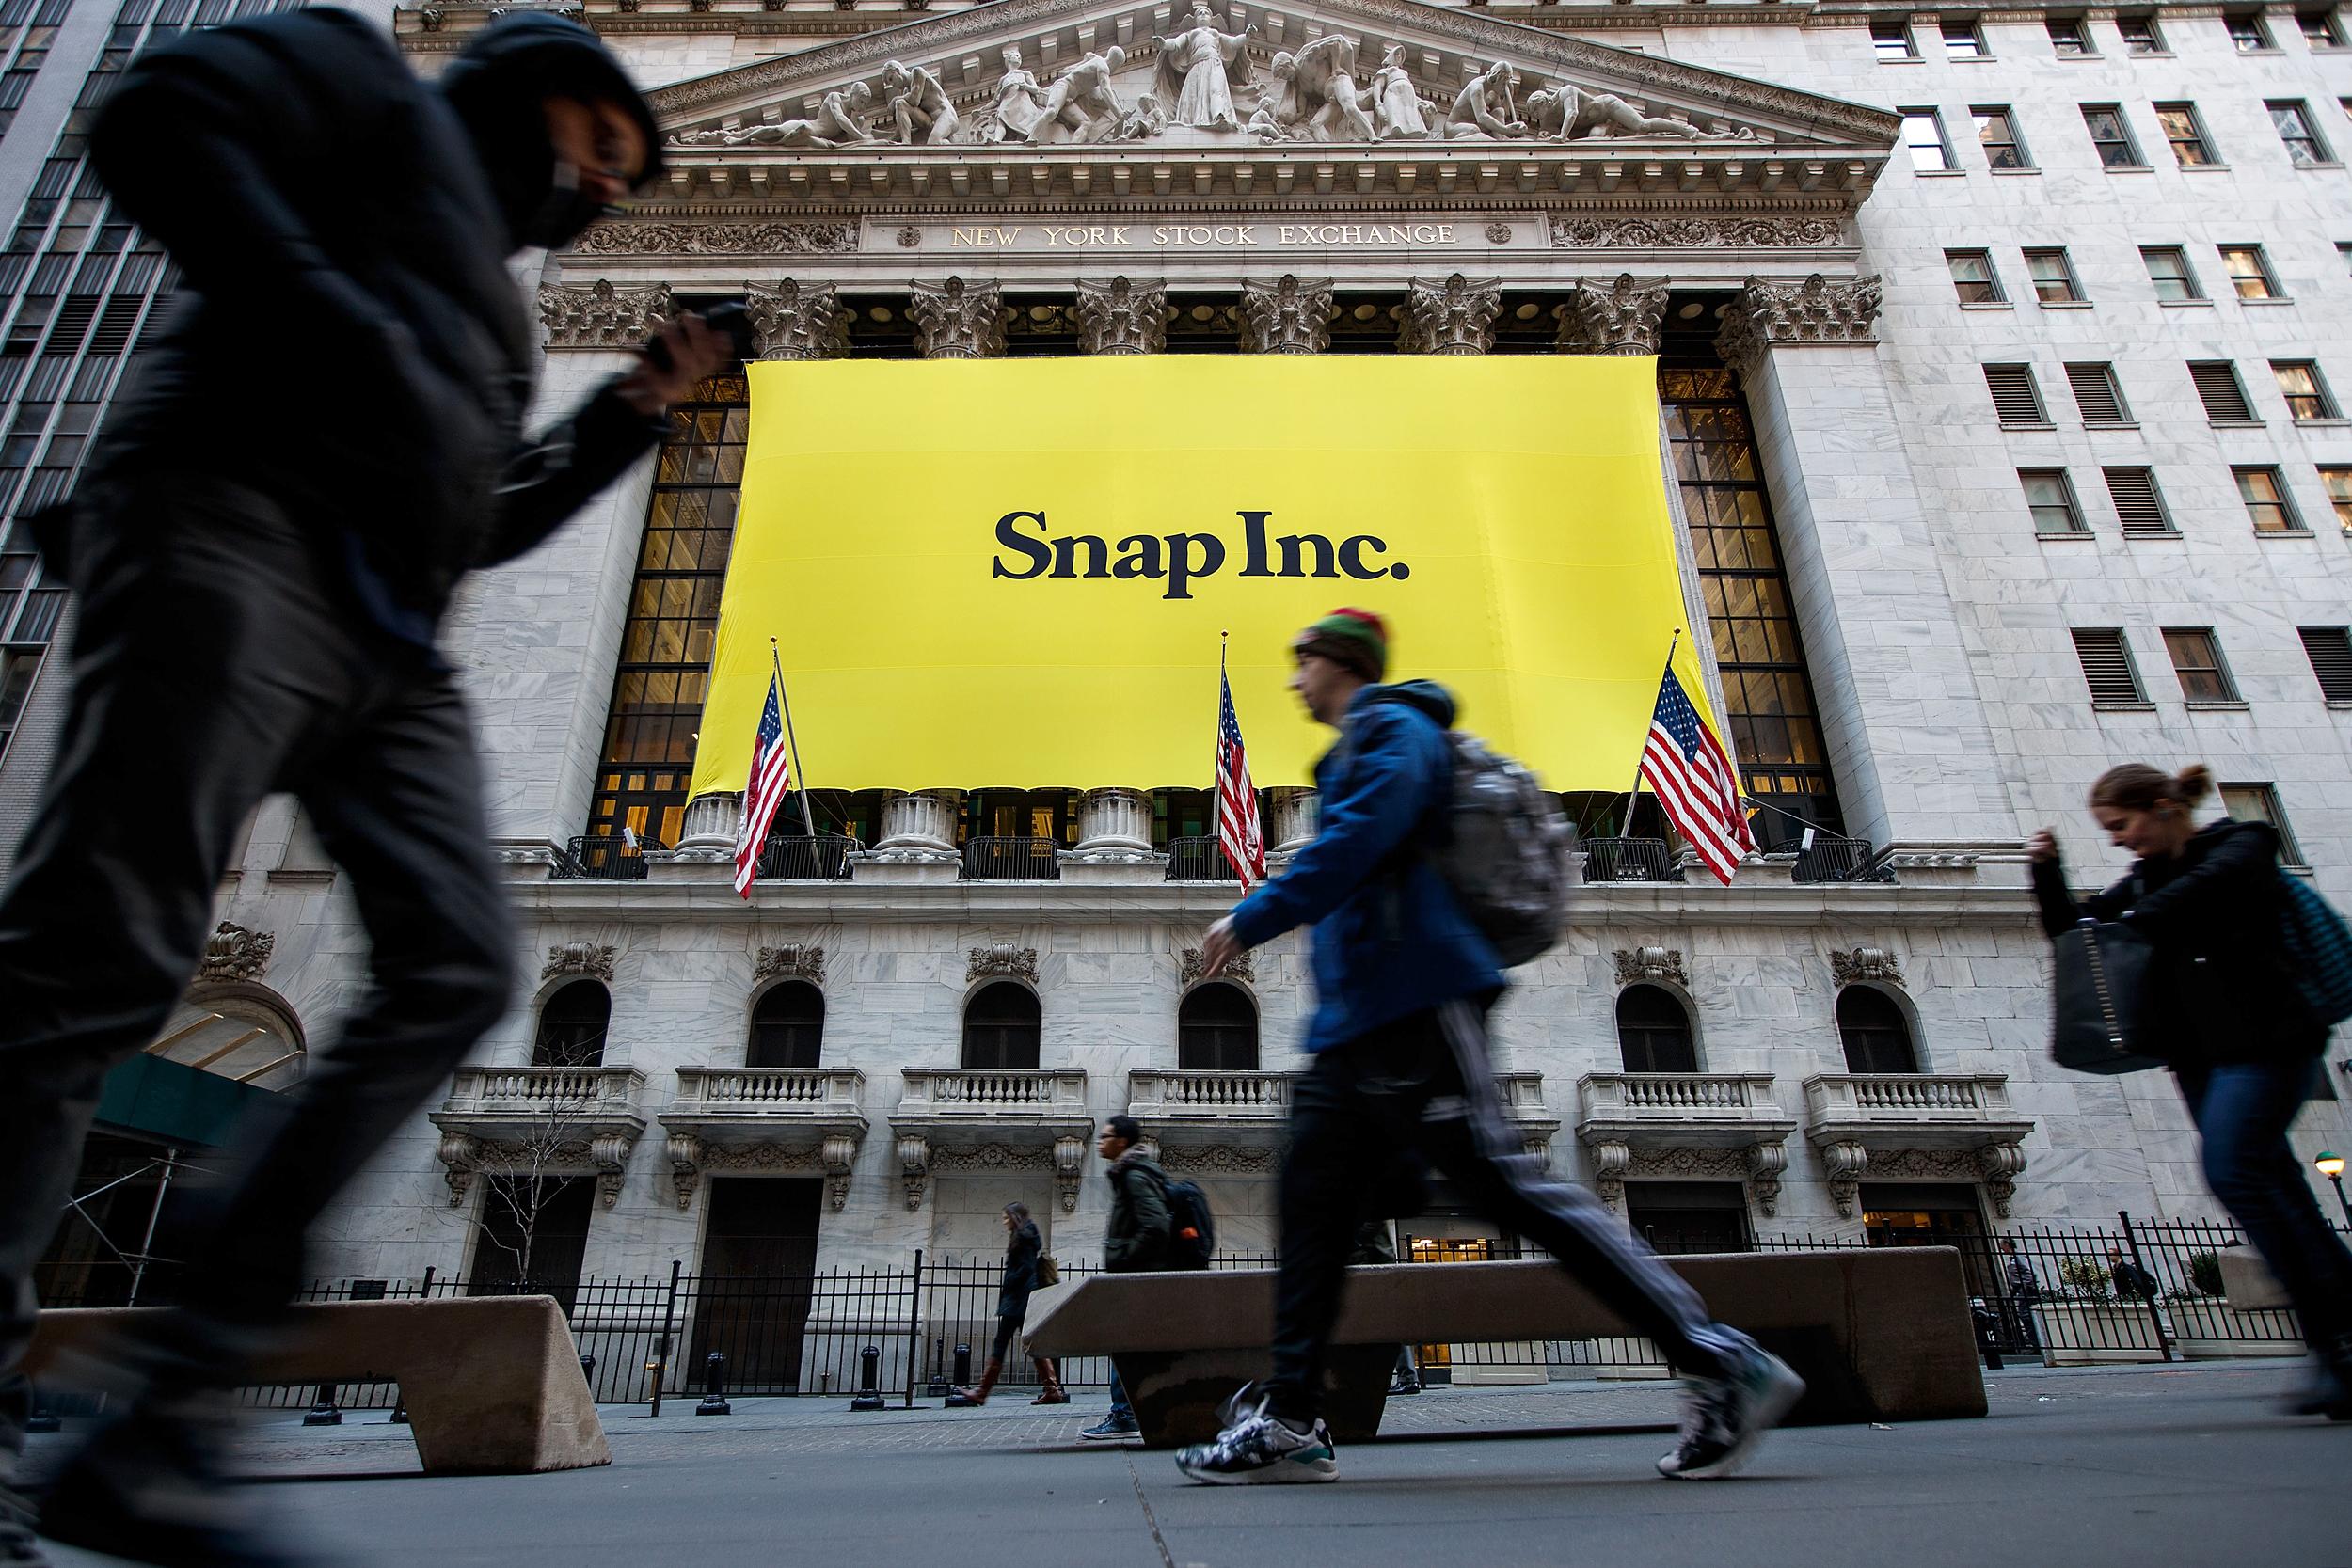 nbcnews.com - SEC subpoenas Snap amid probe into 'growth hacking' and misleading investors